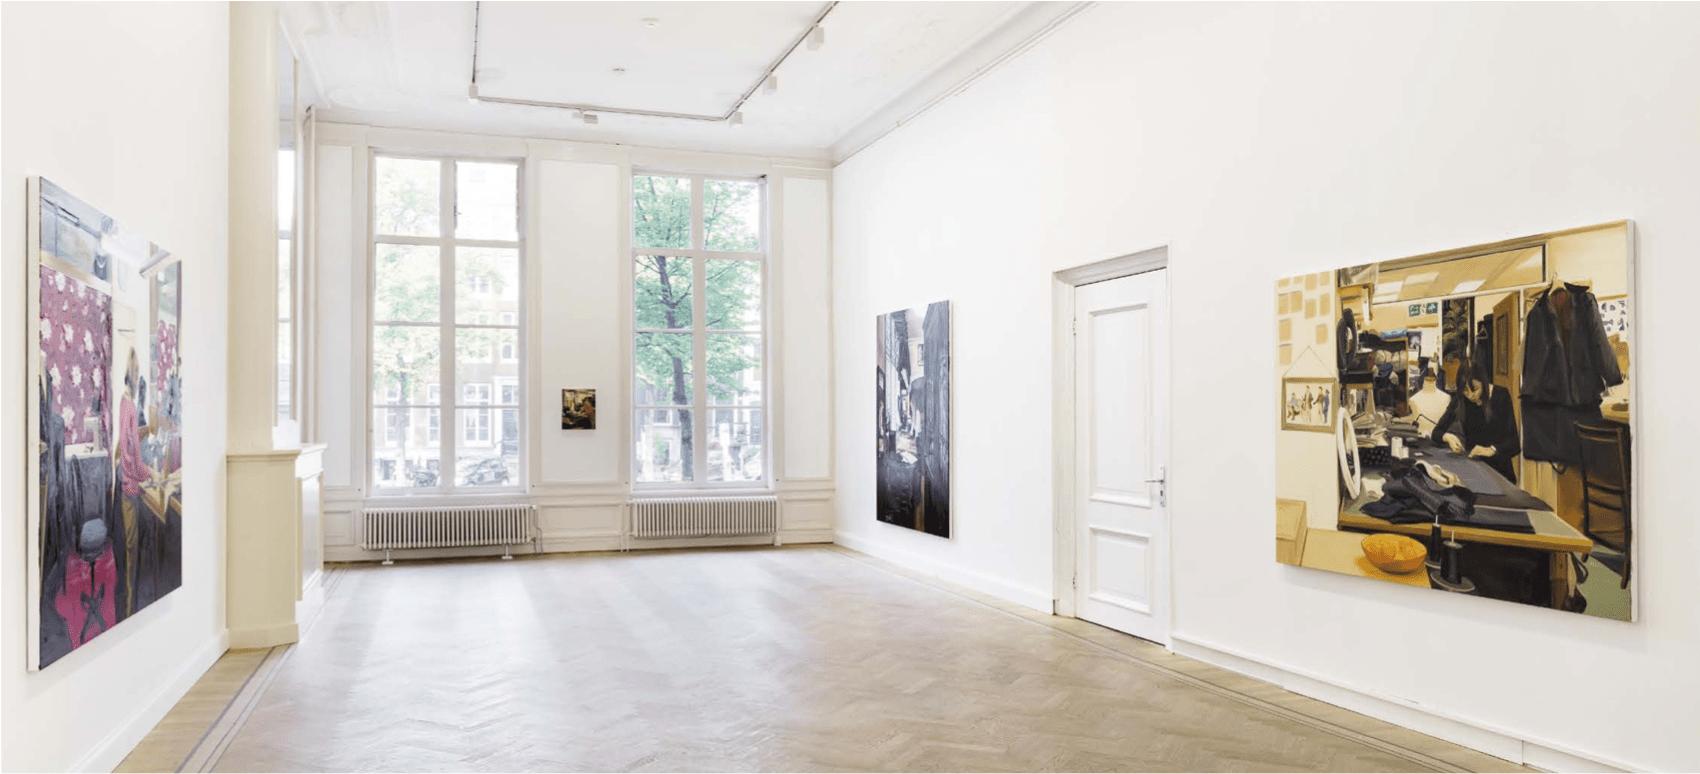 Caroline Walker, A Woman Sewing, 2019, Grimm Keizersgracht (foto: Sonia Mangiapane)